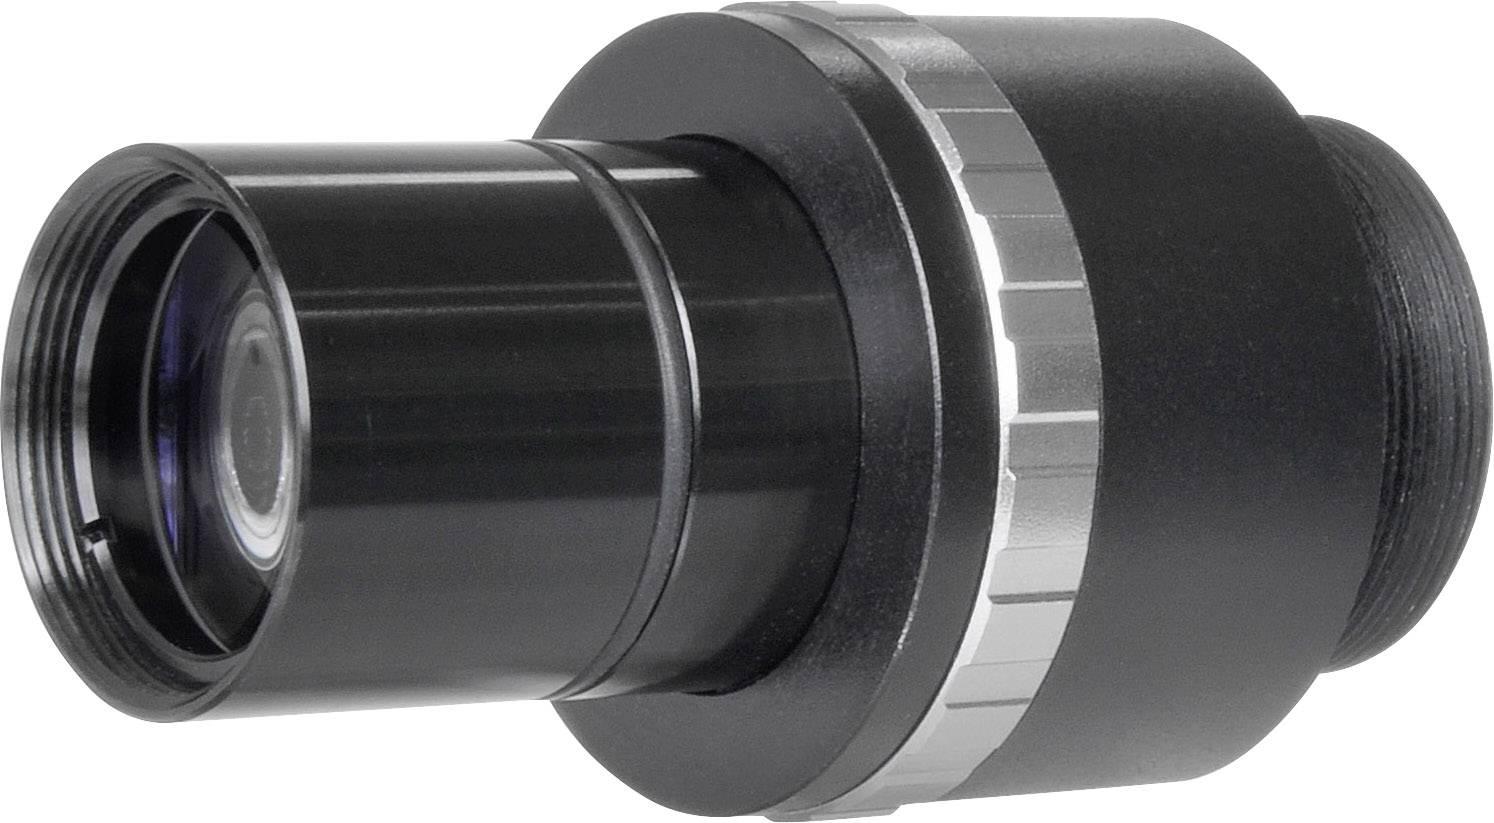 Großhandel großhandels c mount mikroskopadapter für ccd cmos